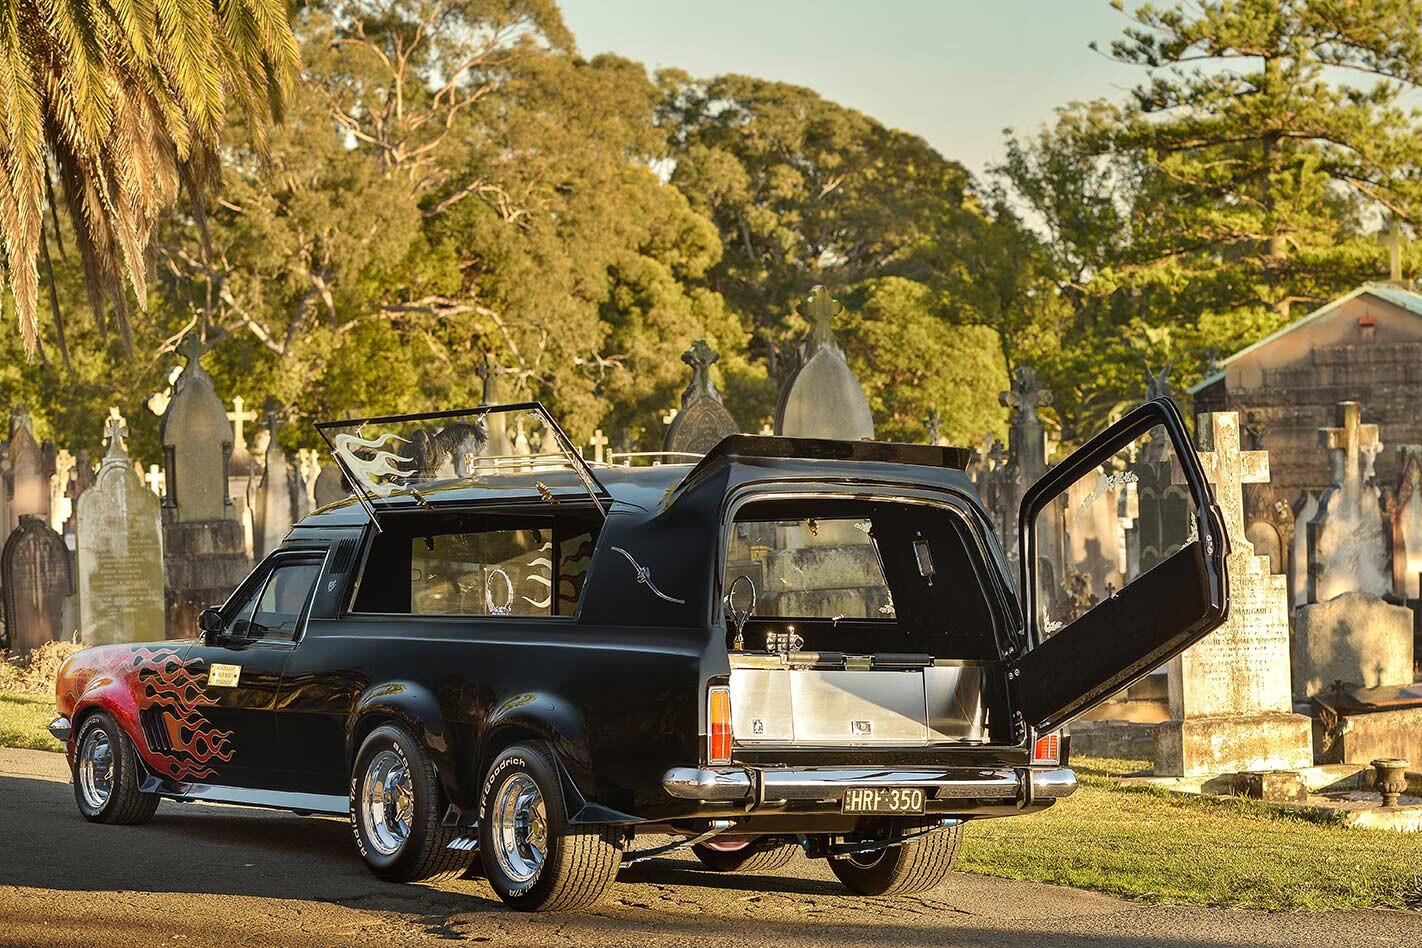 Holden HT hearse